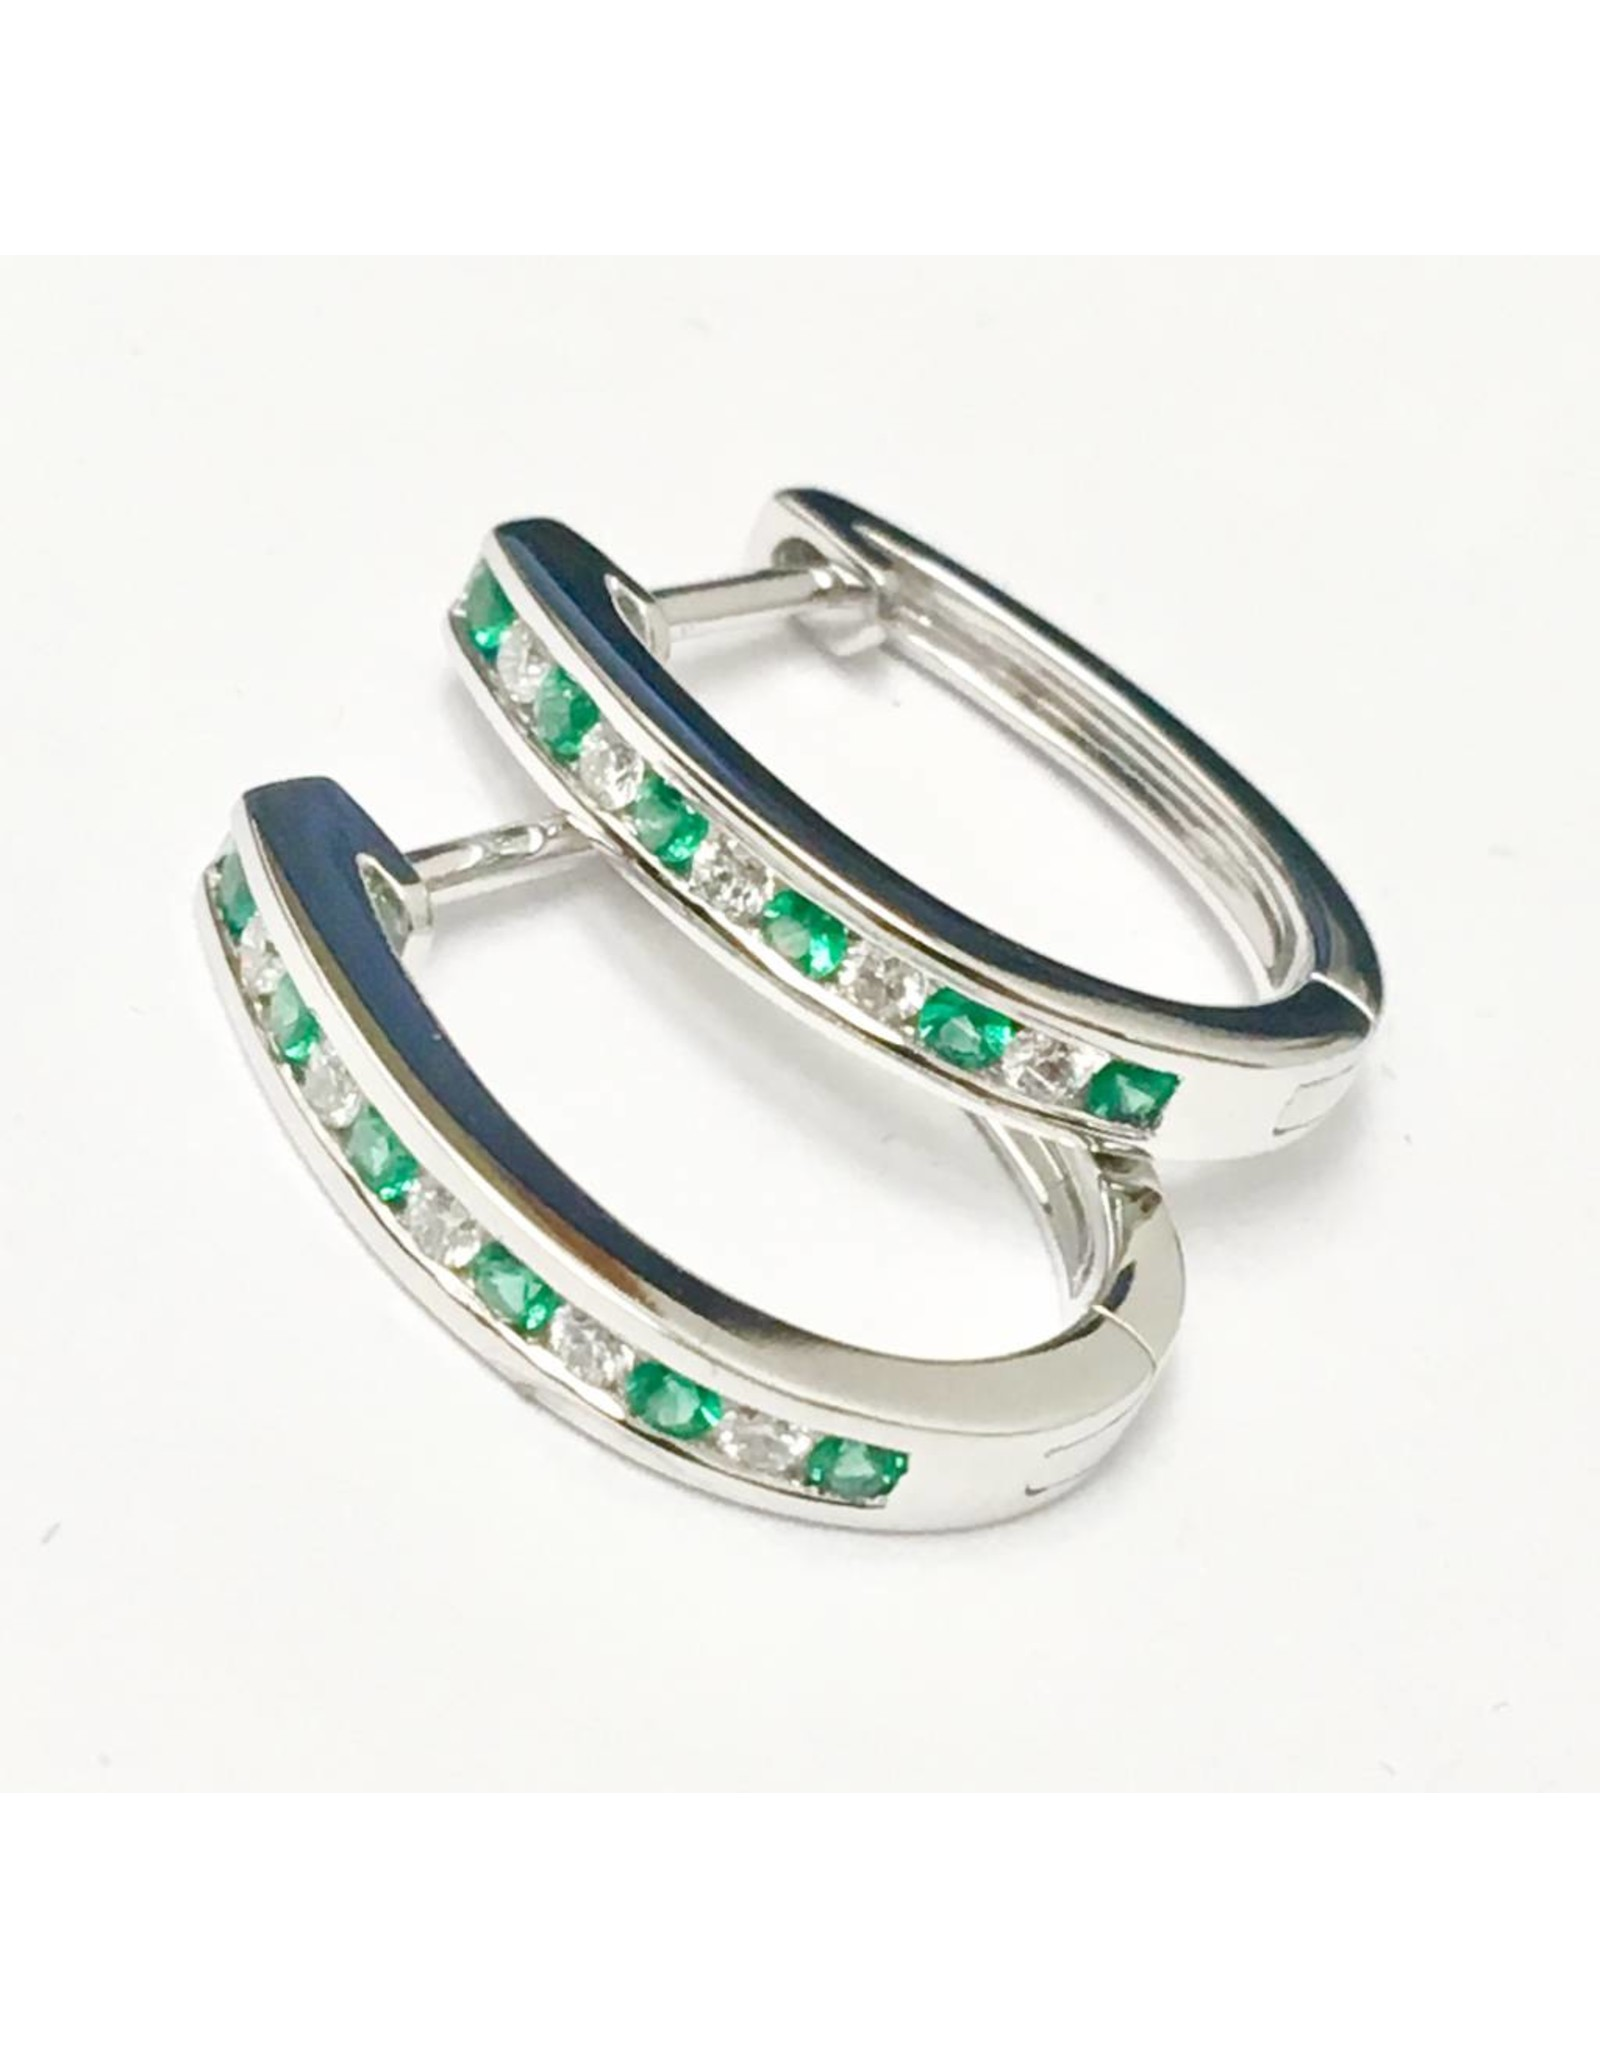 Emerald & Diamond Earrings 14KW